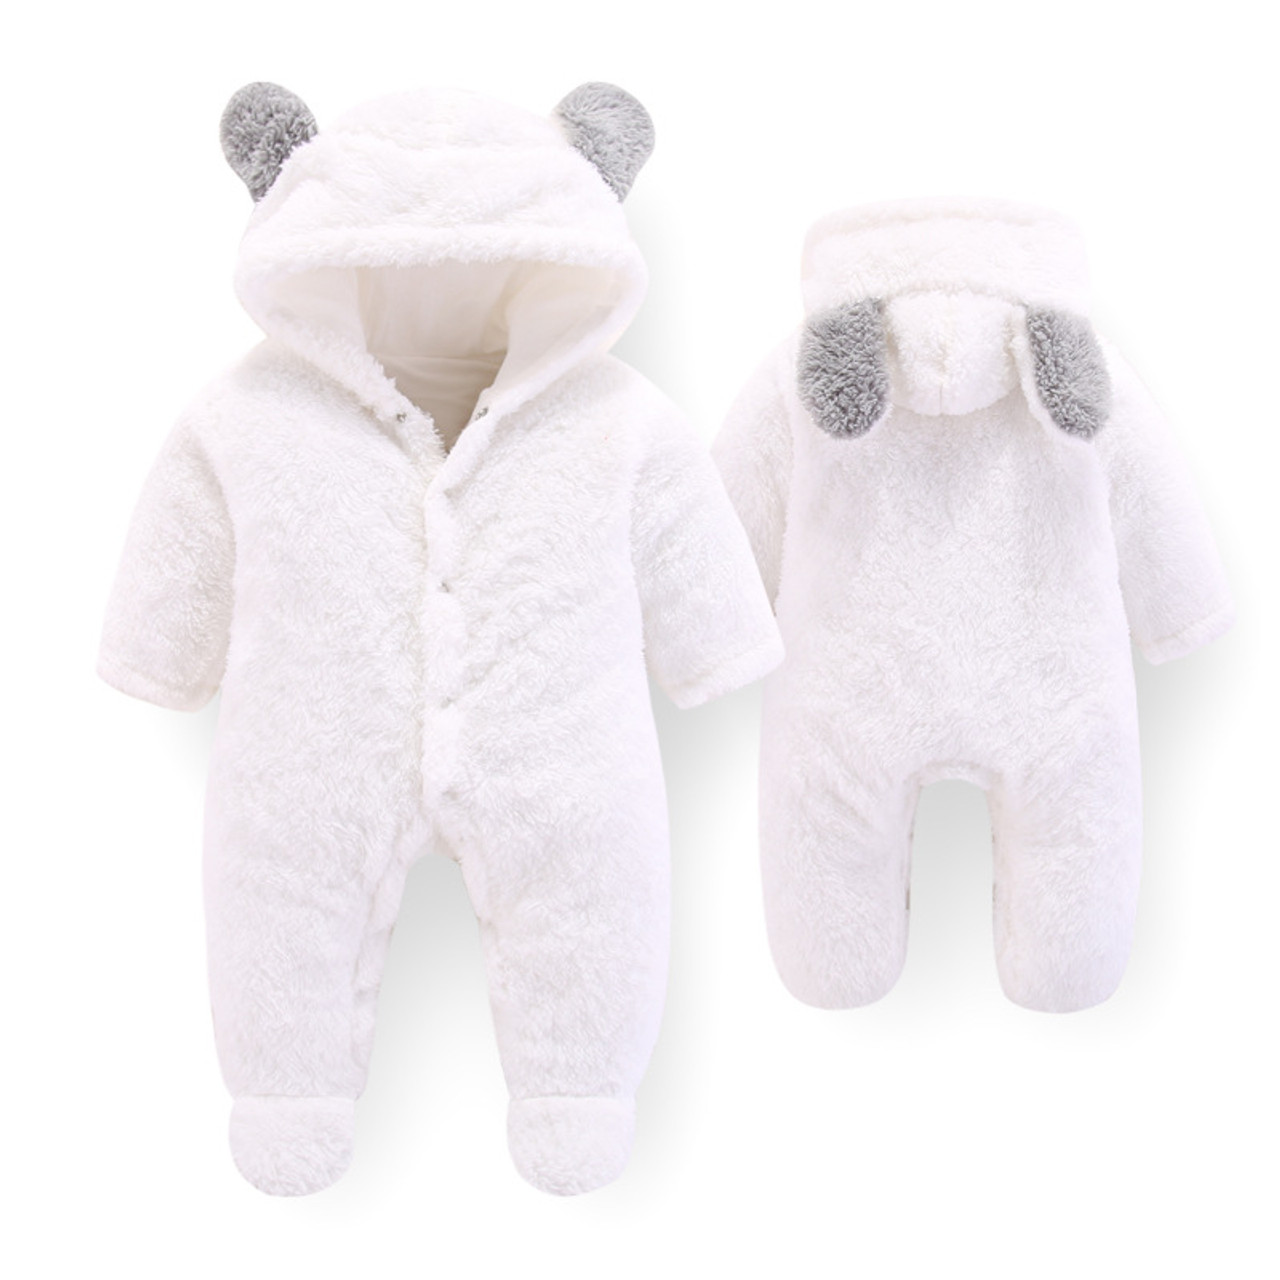 129fdce95 ... BibiCola baby rompers winter newborn baby winter thick velvet jumpsuits  for bebe boys girls toddler hoodies ...